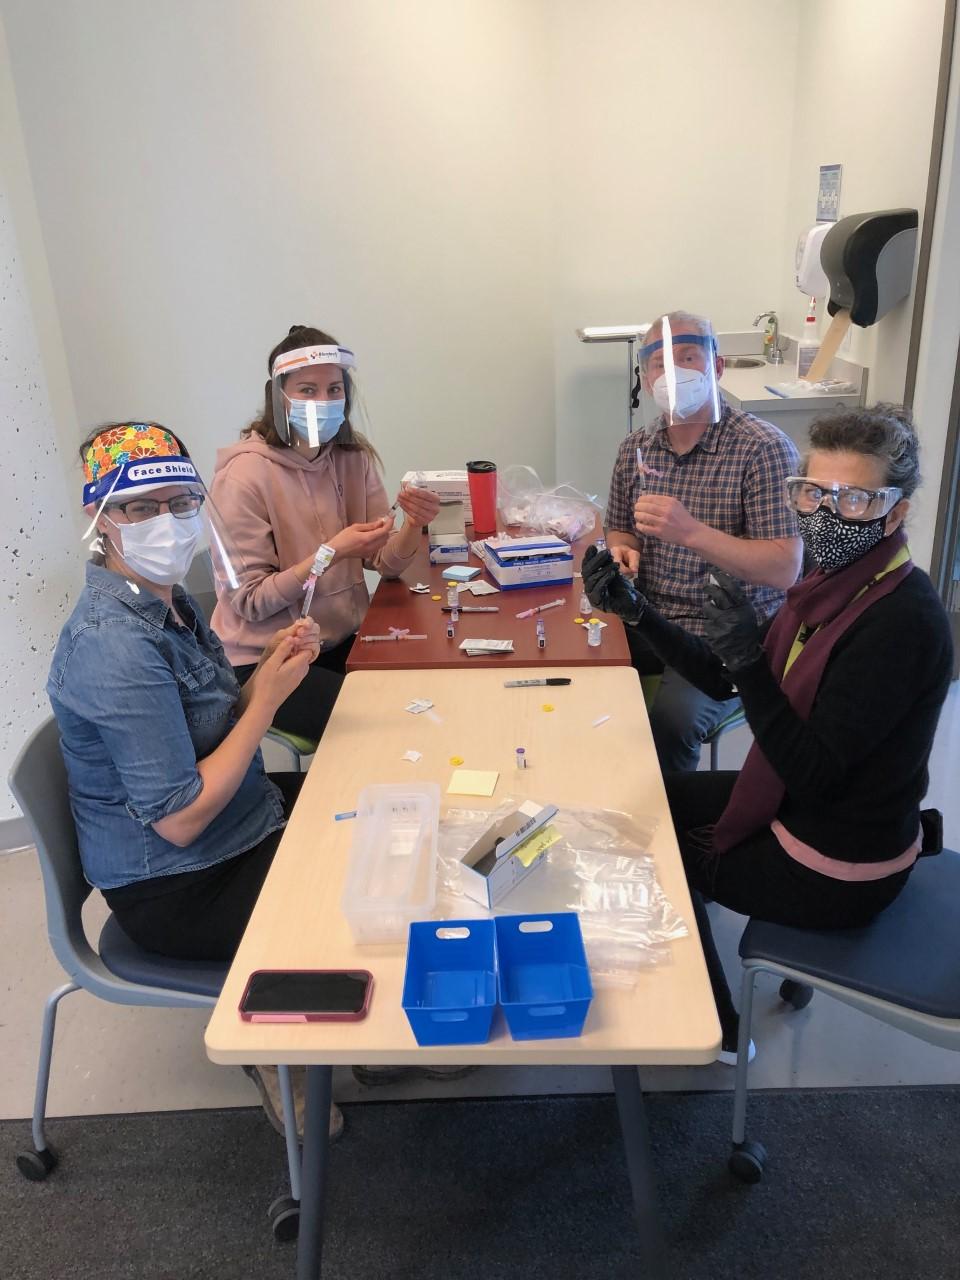 Four nurses sit around a table preparing vaccines